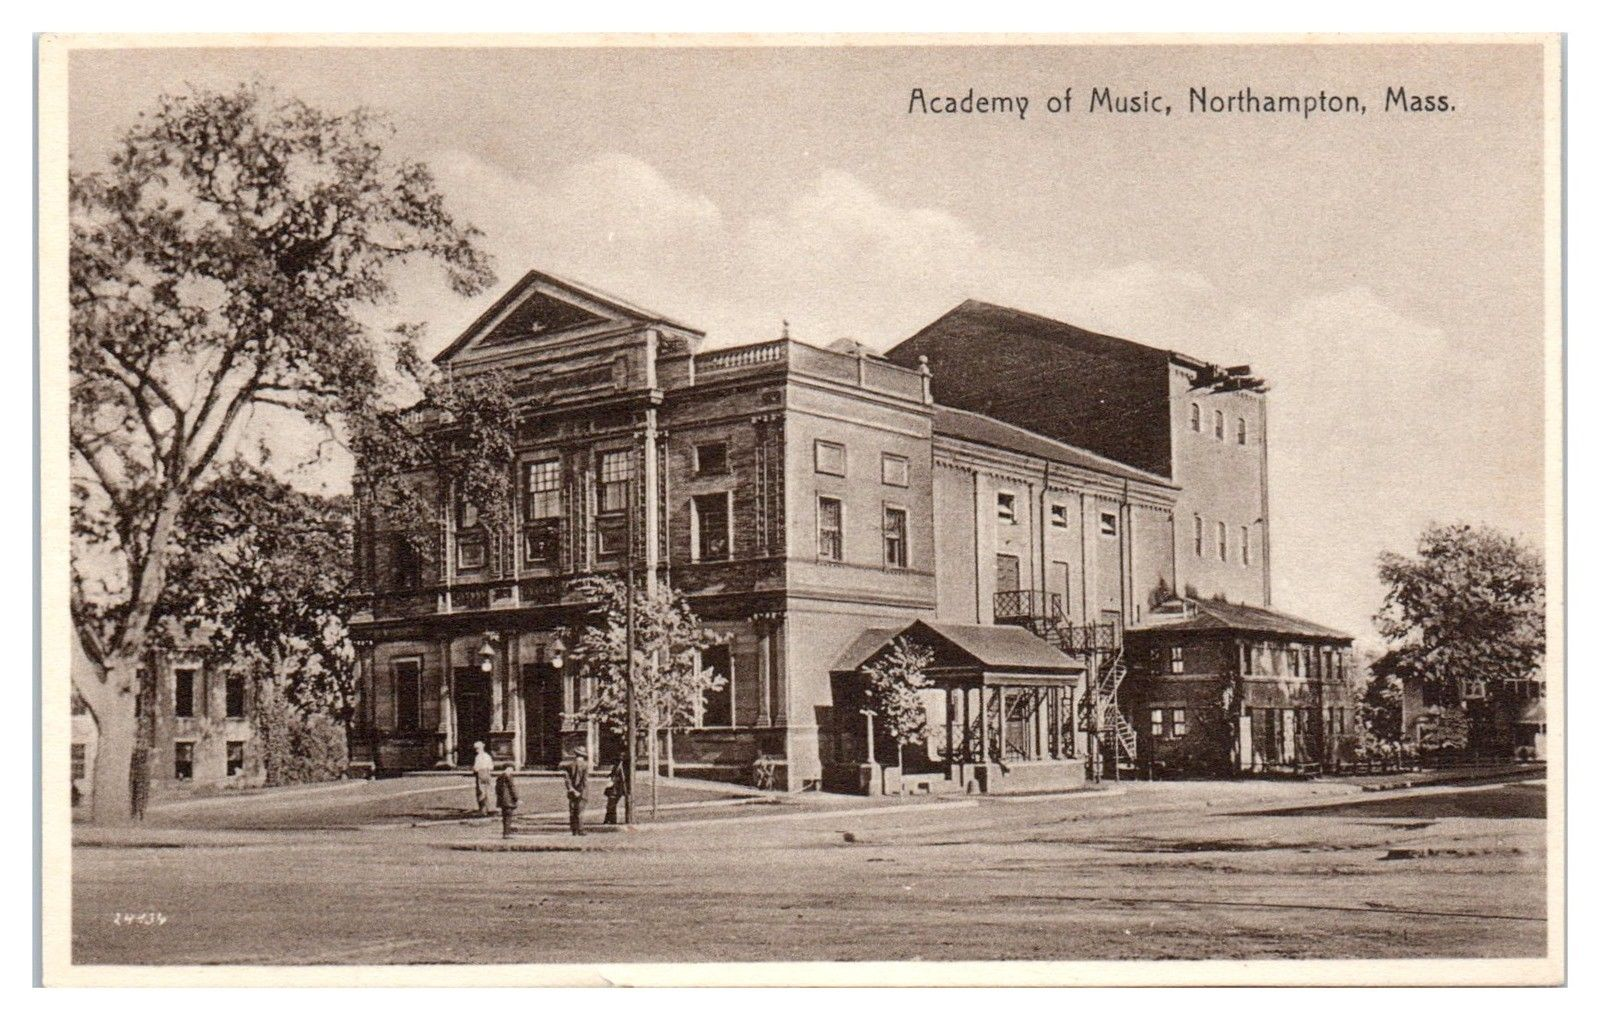 Early 1900s Academy of Music, Northampton, MA Postcard / HipPostcard